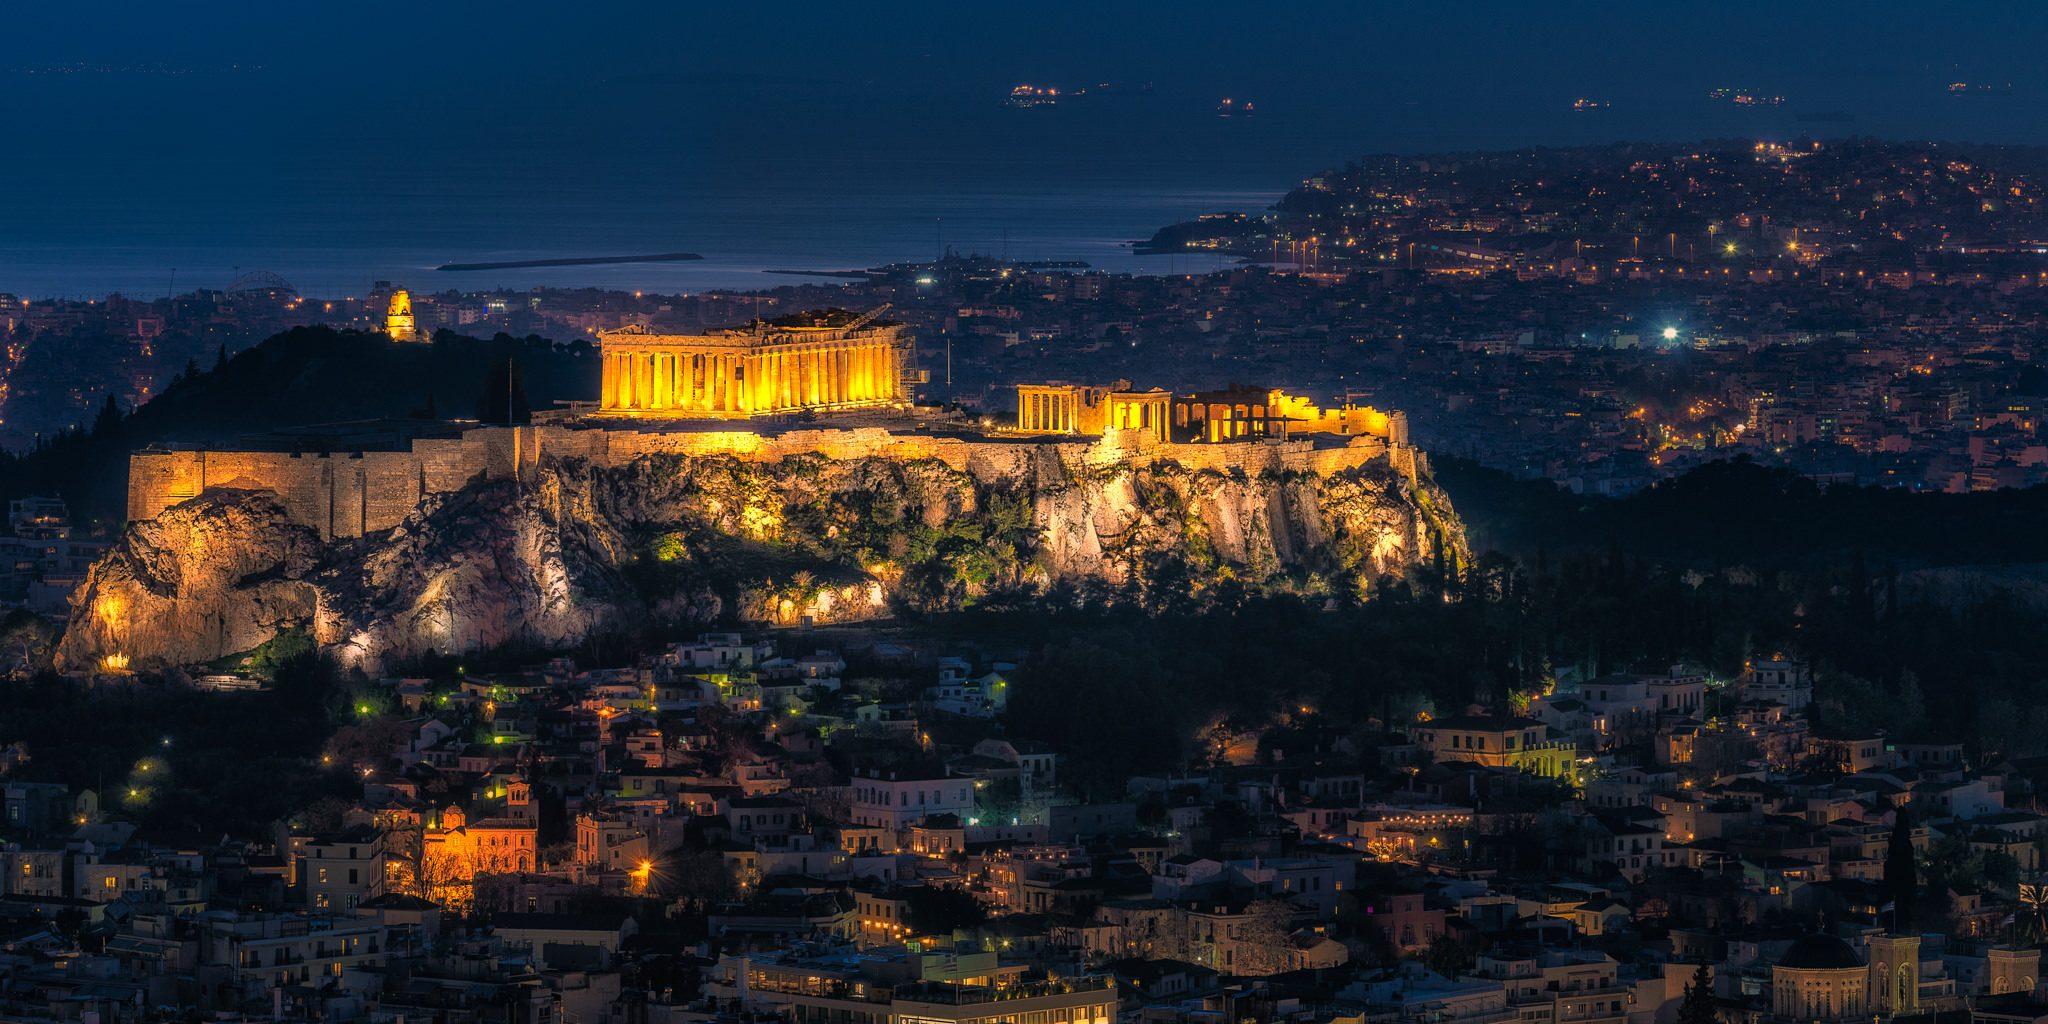 Parthenon in Athens enlighten during night